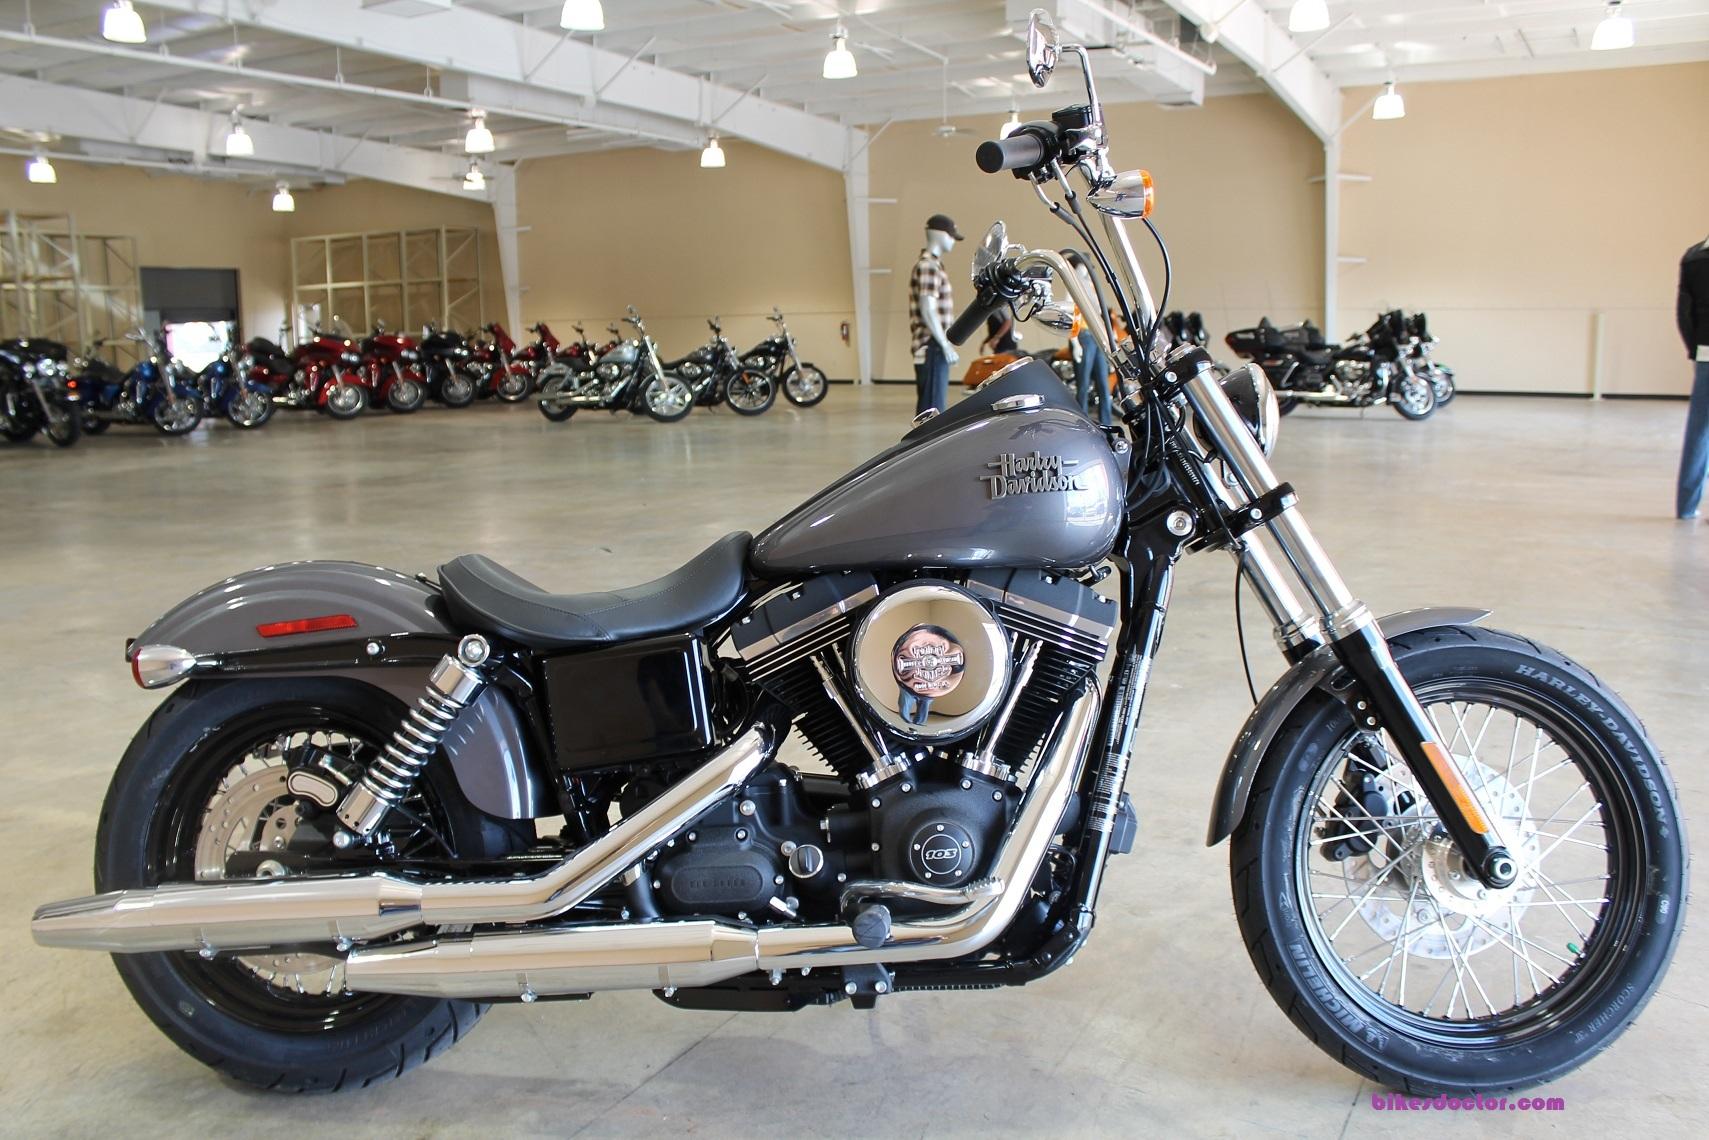 Harley Davidson Street Bob SE Milwaukee Scorching Road Test Bikes 1709x1140